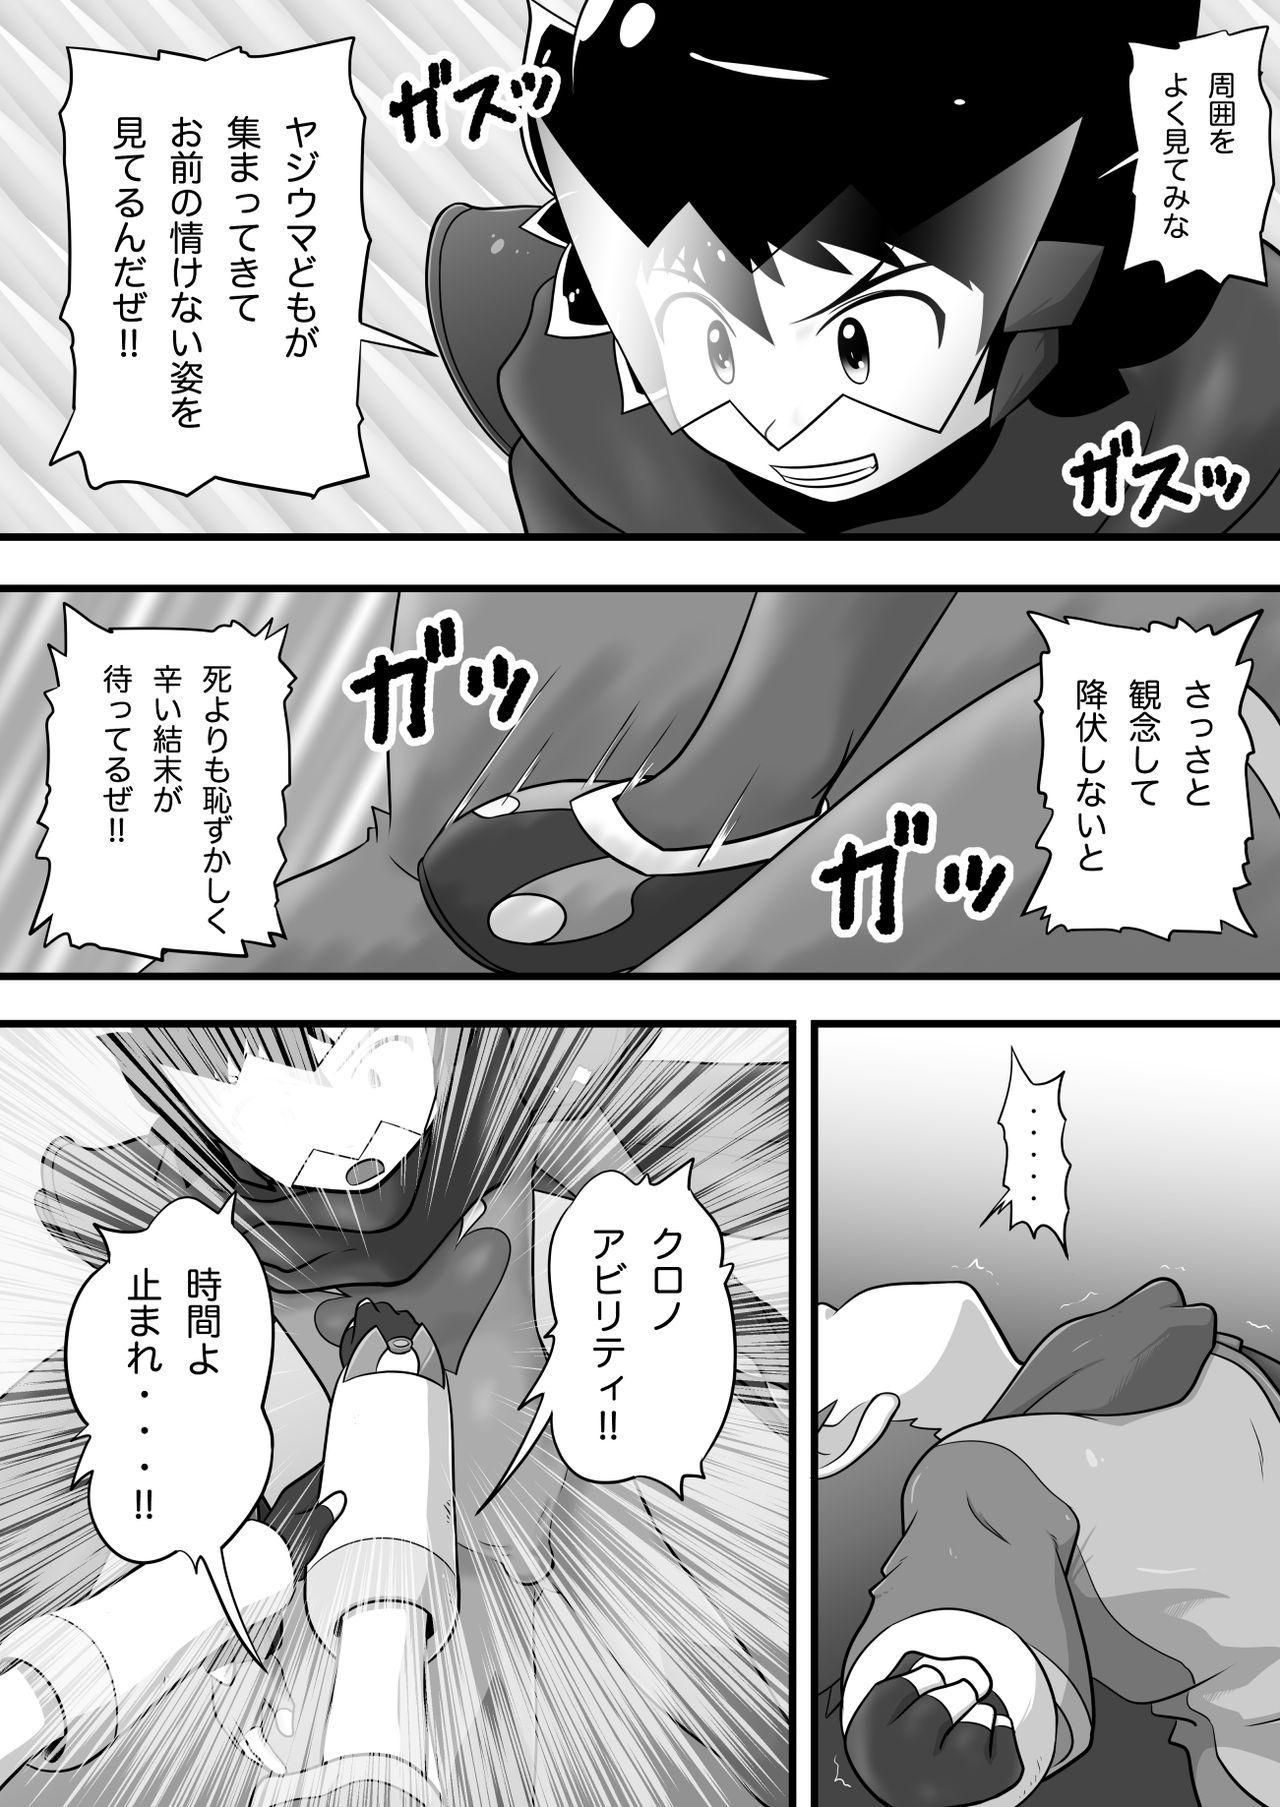 Chrono Kid TSURUGI VS Enboy 12